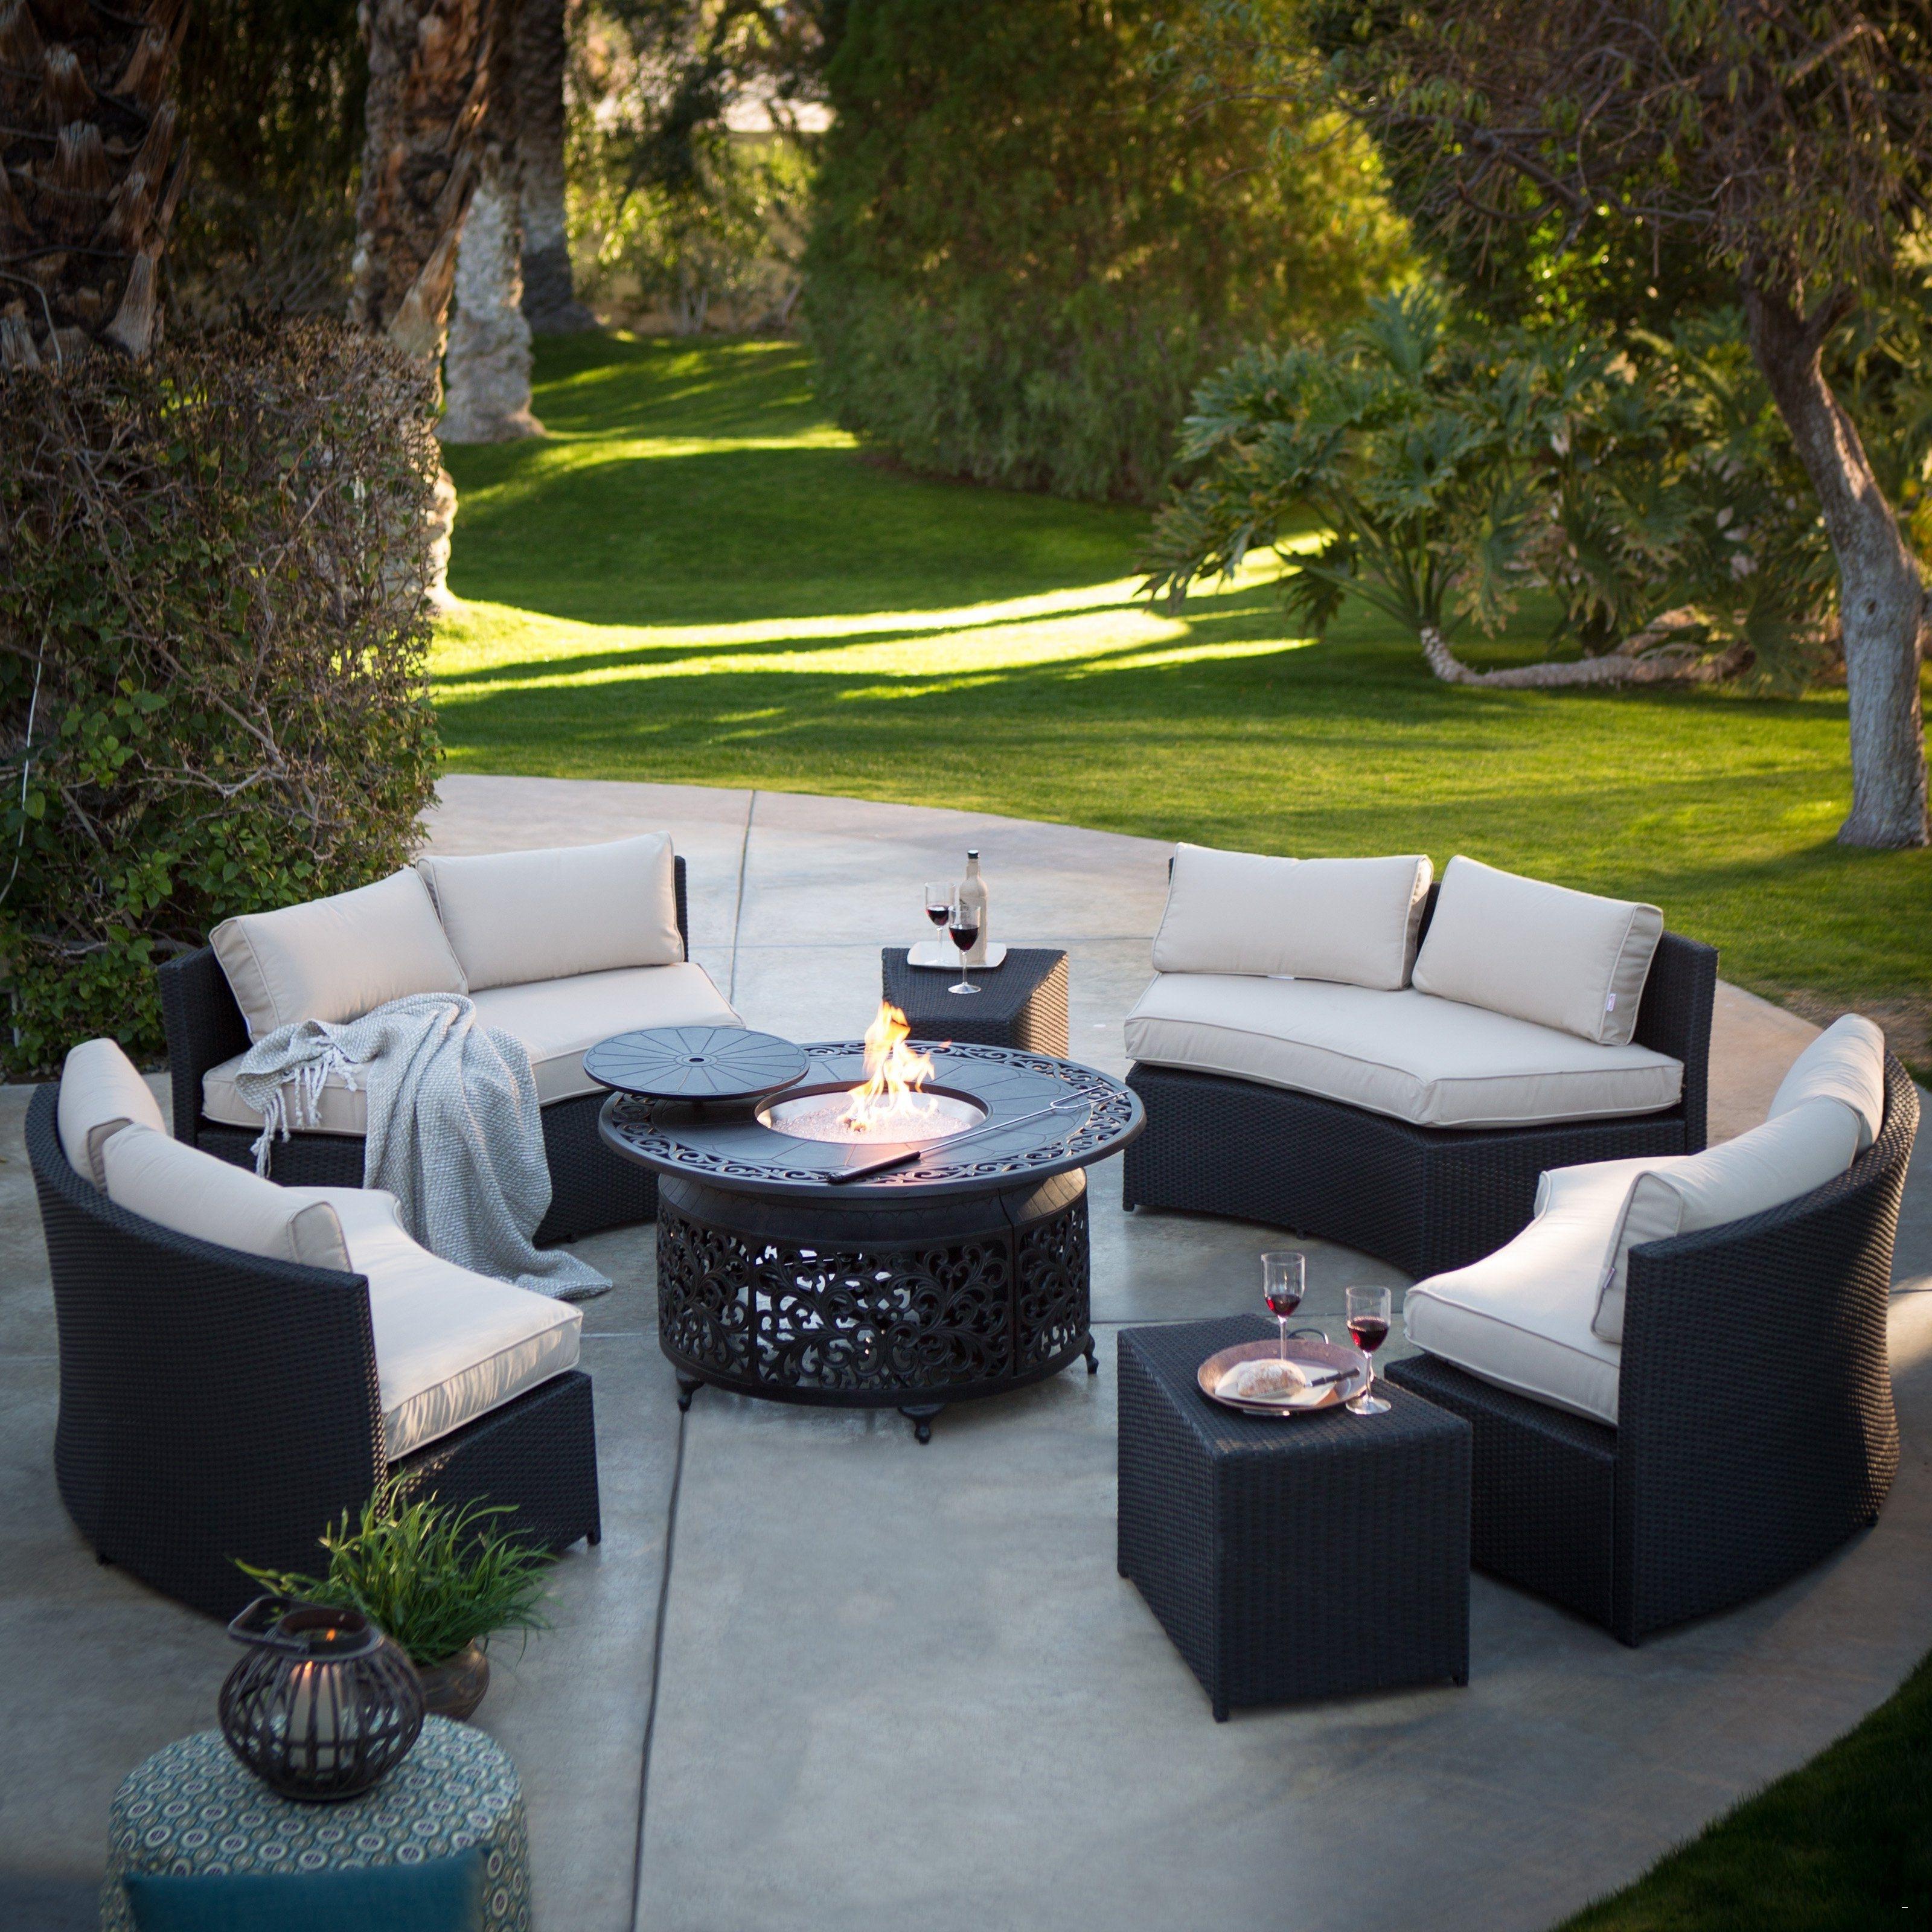 2017 Patio Furniture Conversation Sets With Fire Pit Regarding Cheap Patio Furniture Sets Under 100 – Gorgeous Patio Conversation (View 7 of 15)